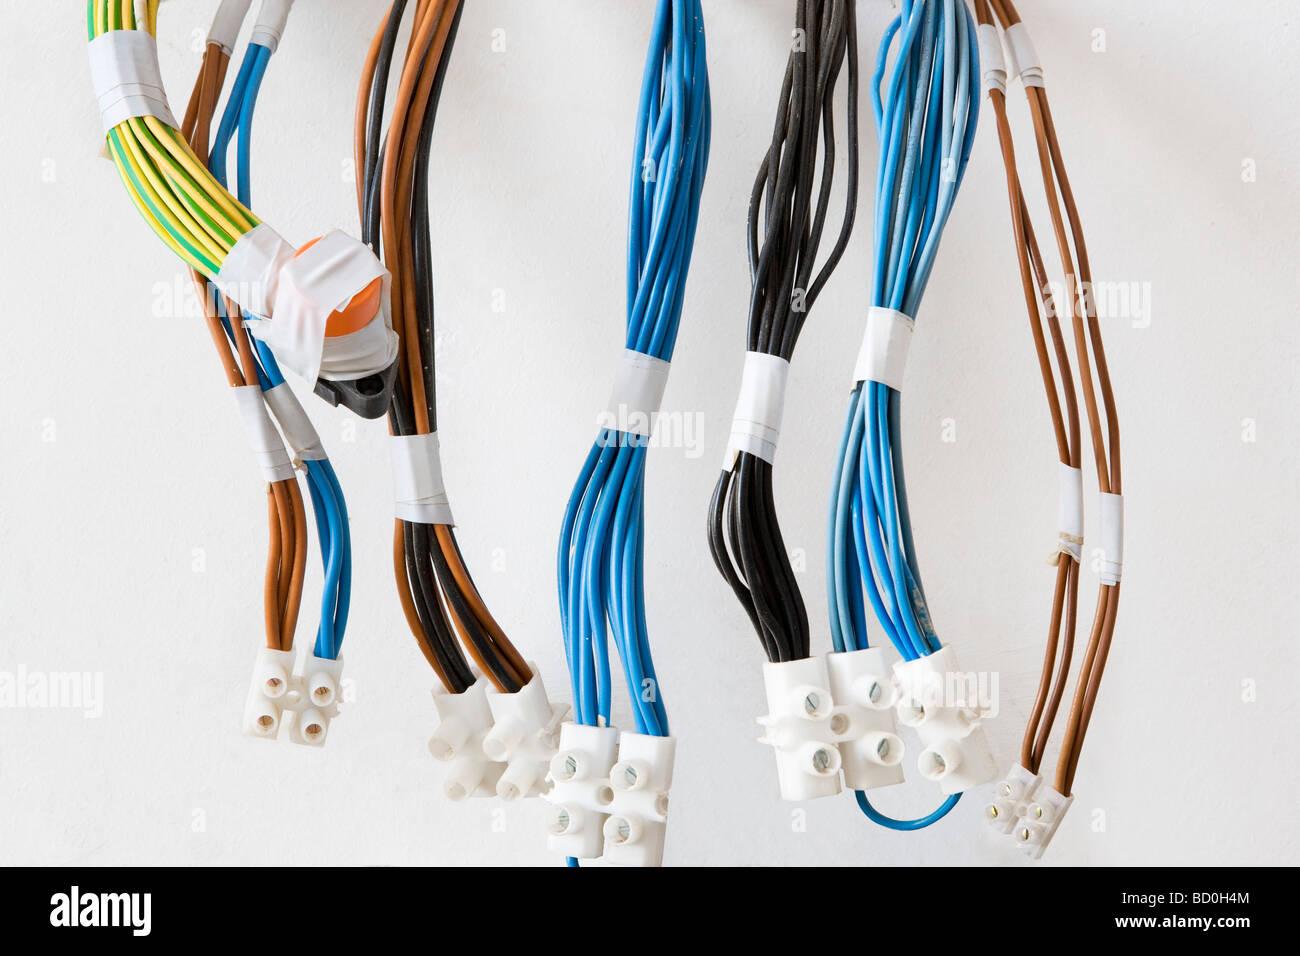 Più cavi elettrici Foto Stock